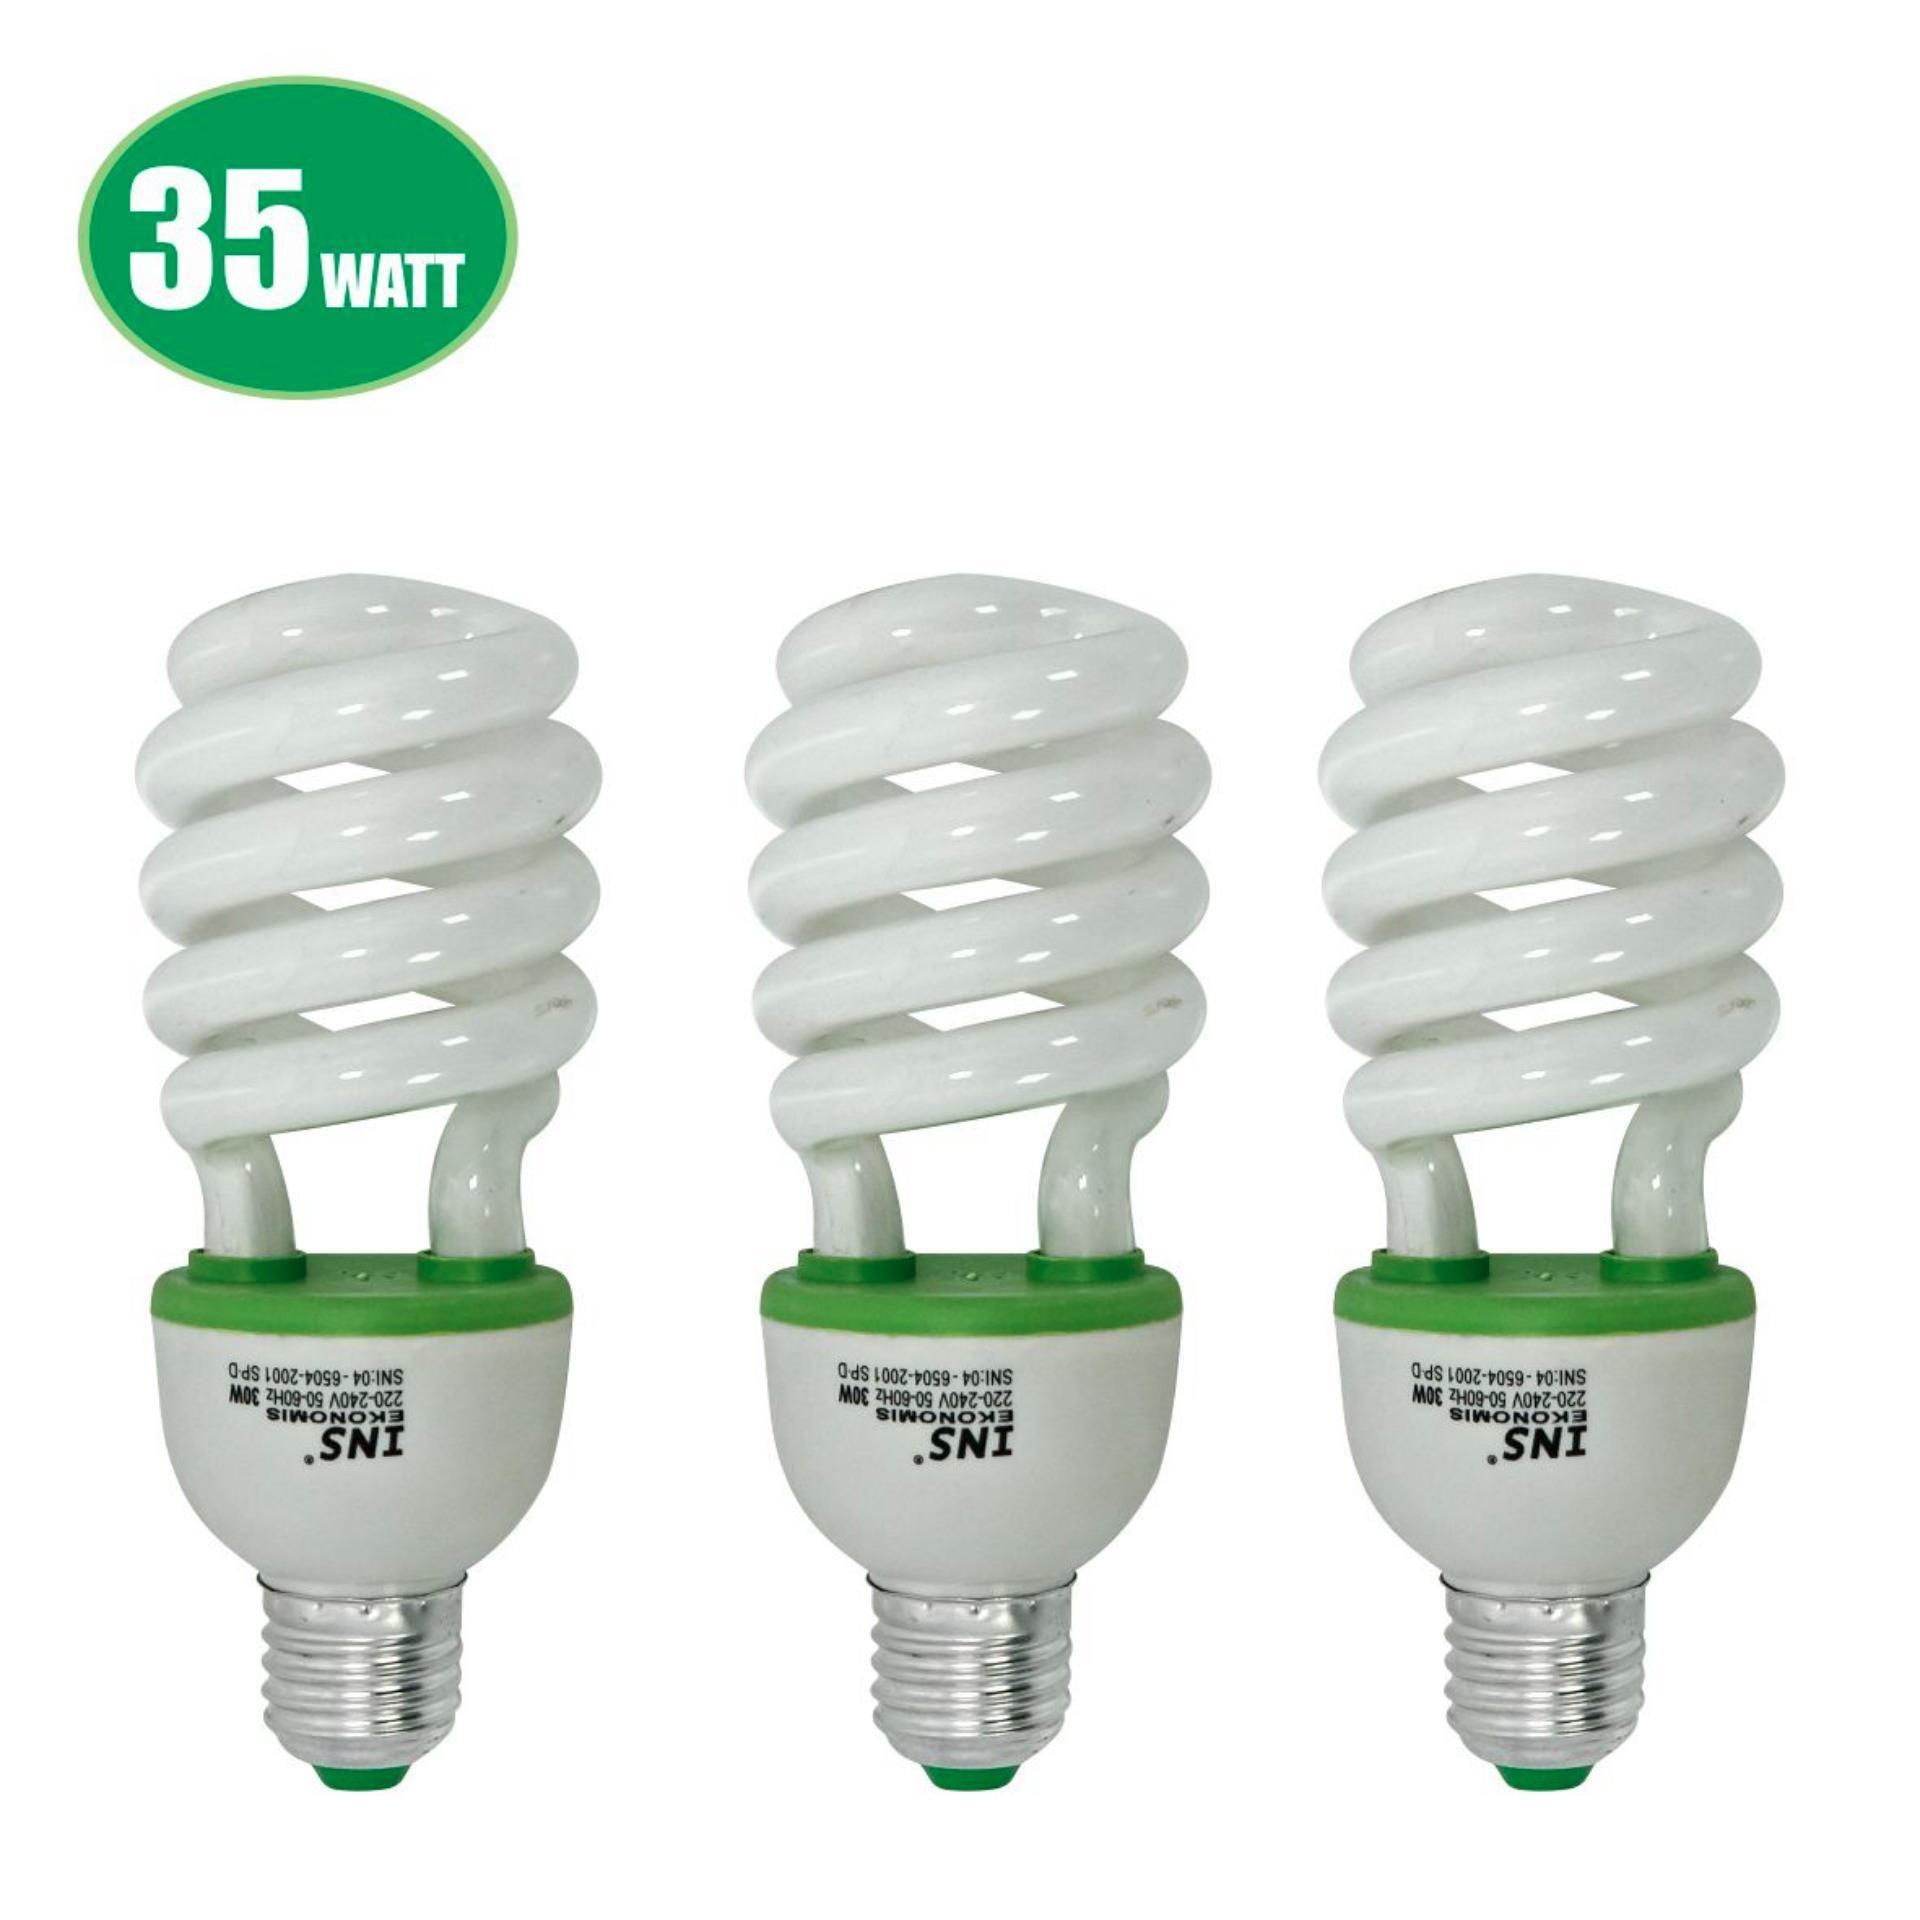 Jual Lampu Bohlam Bulb Led 27watt Bulat Weitech Hemat Energi Spiral 3 Pcs 35w Putih